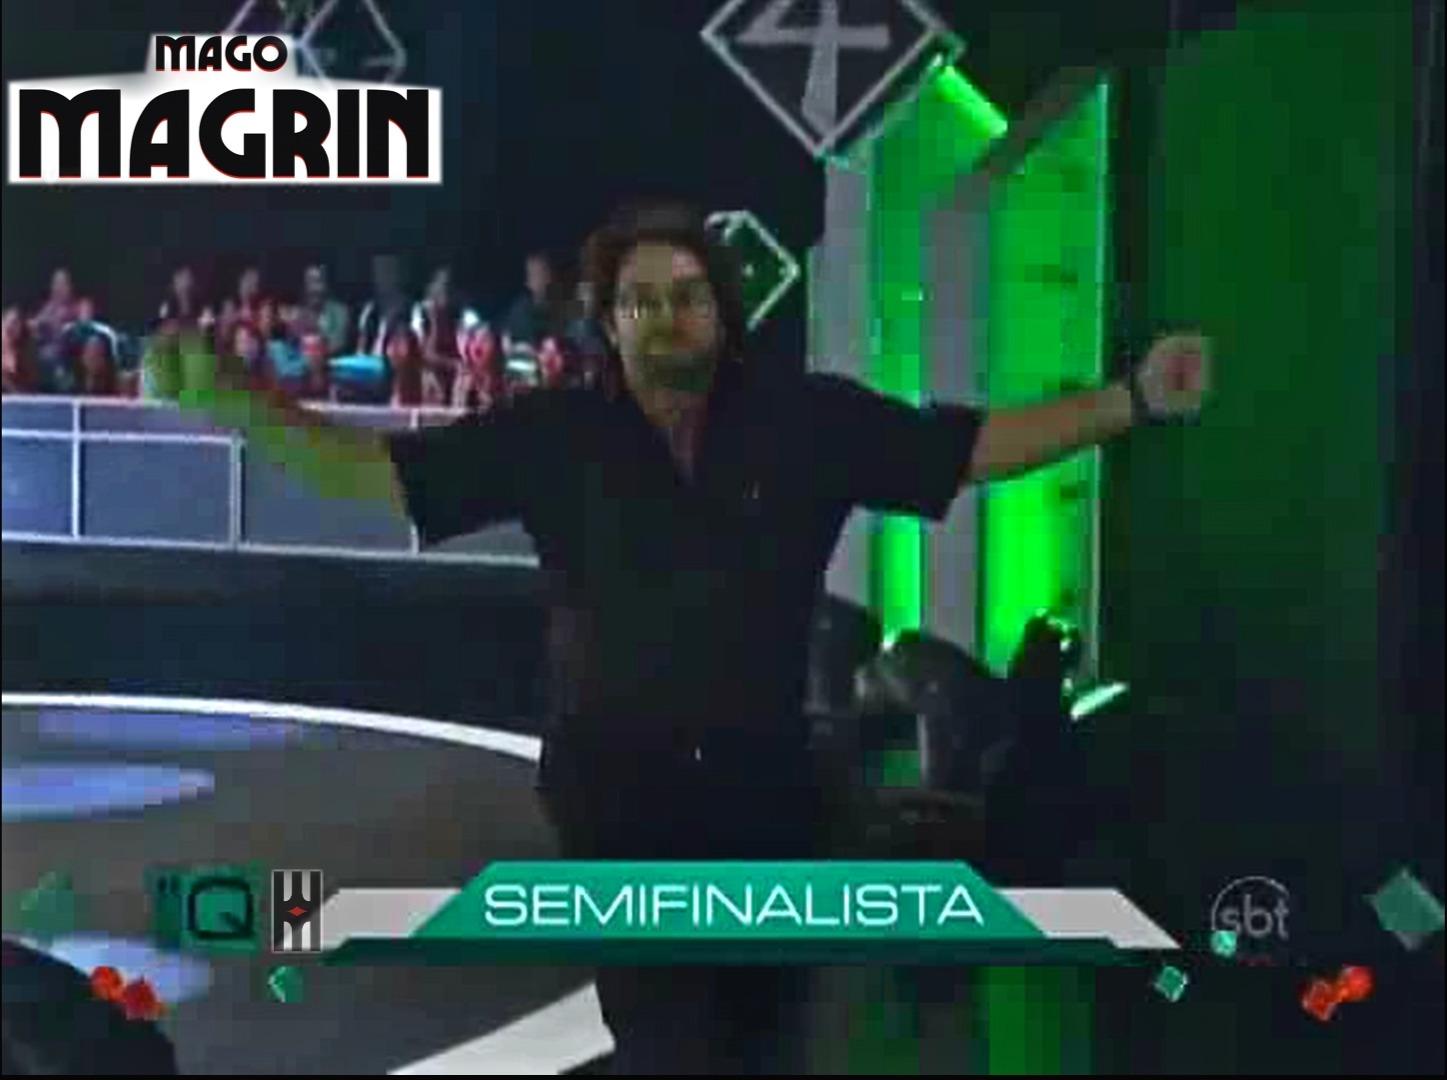 Mago Magrin Semifinalista dancinha final